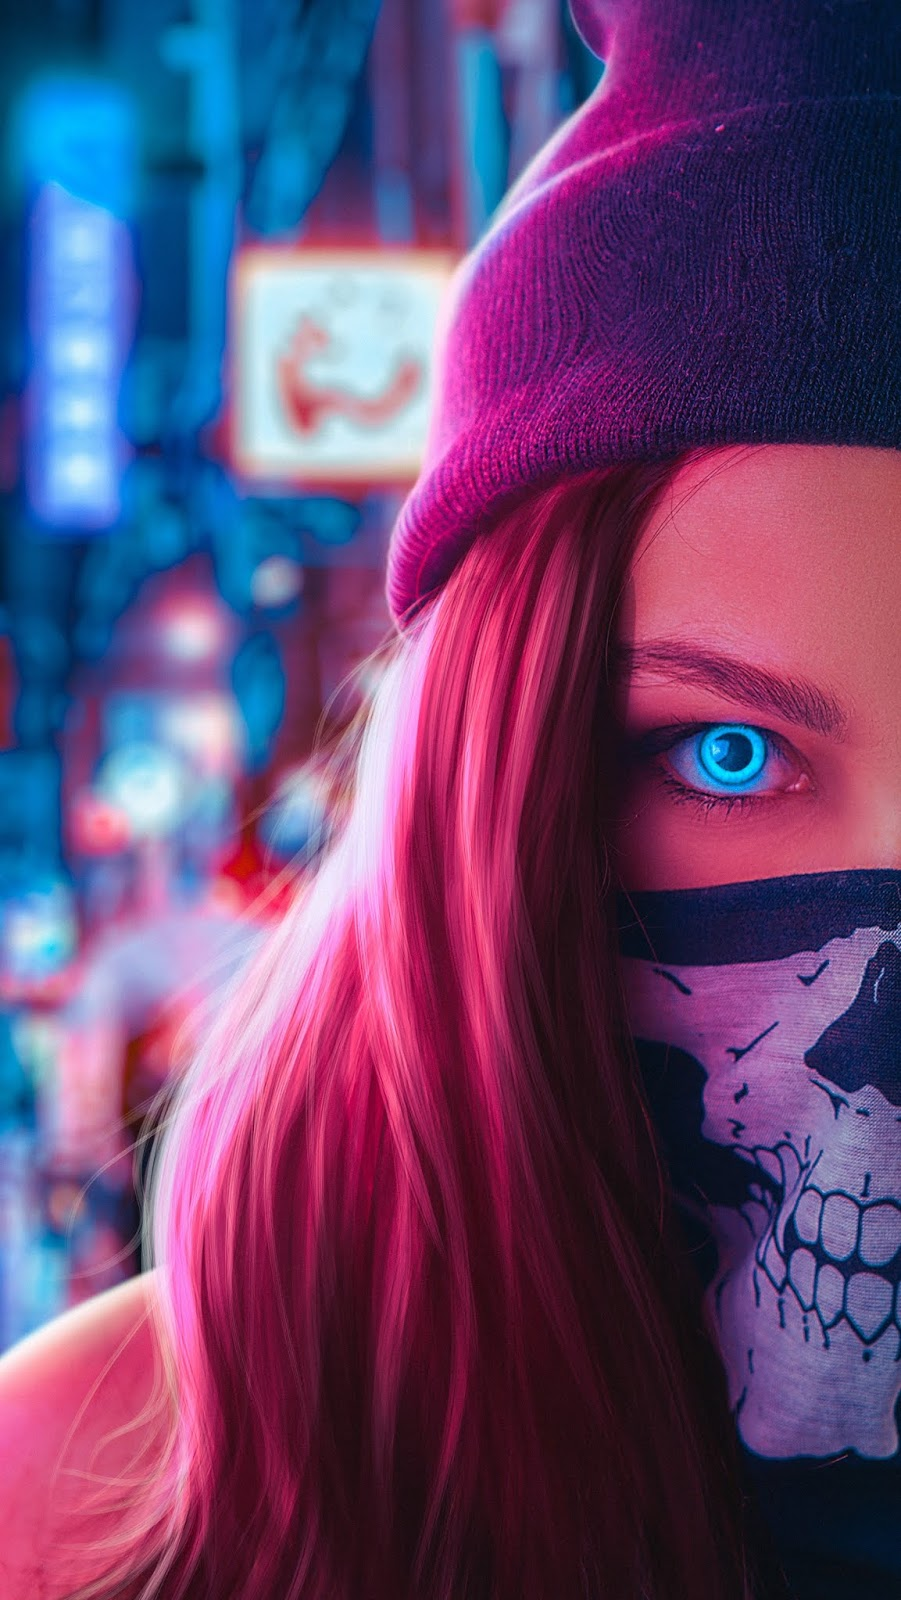 Blue eyes wallpaper